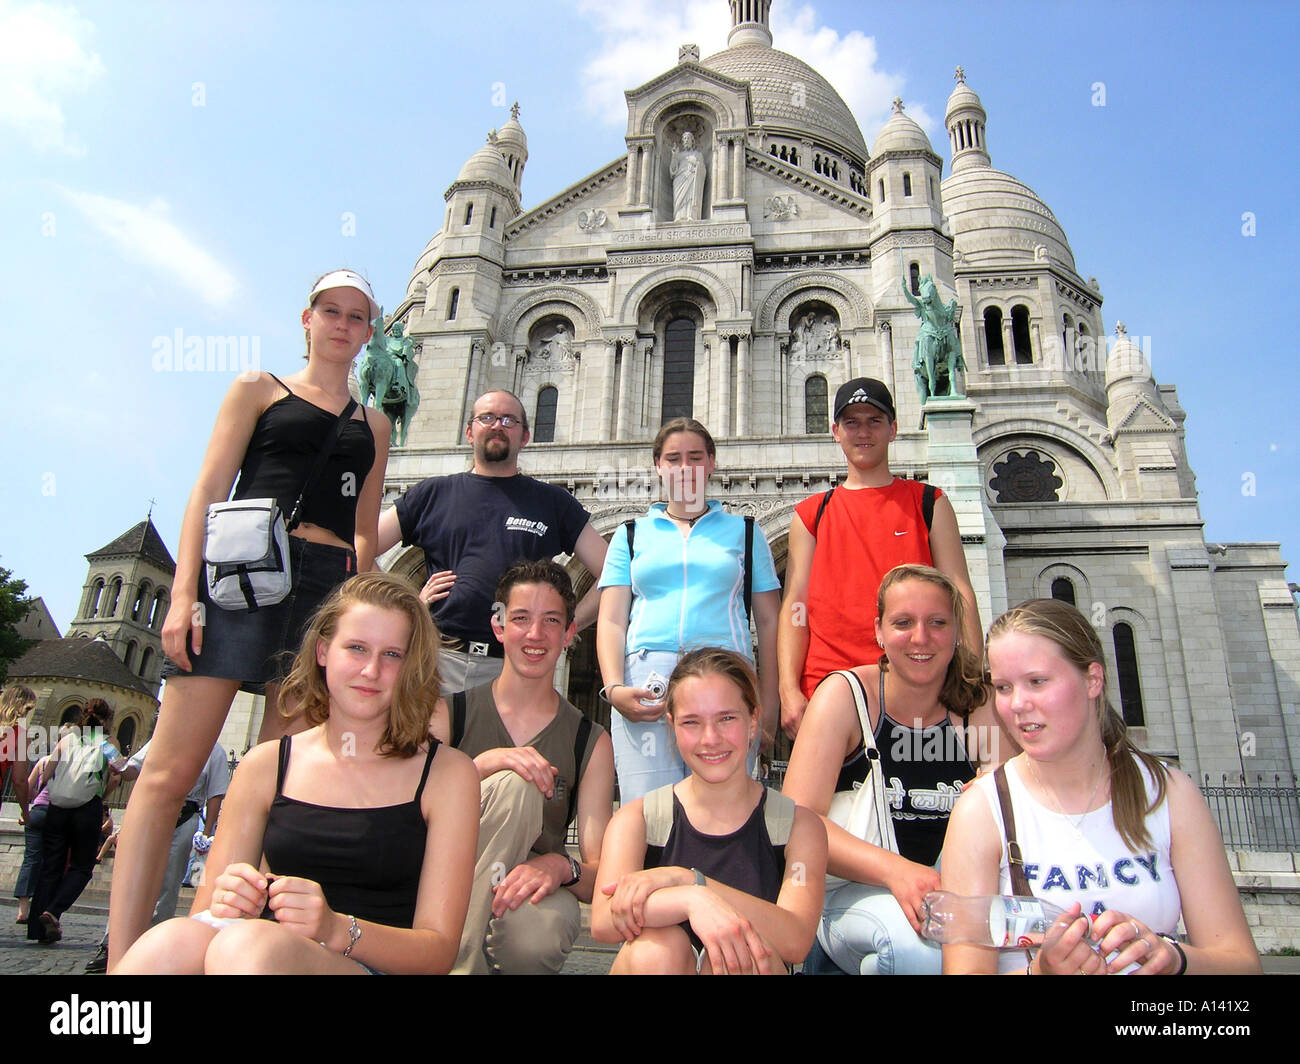 snapshot of school group posing in front of Sacre Coeur Paris France - Stock Image